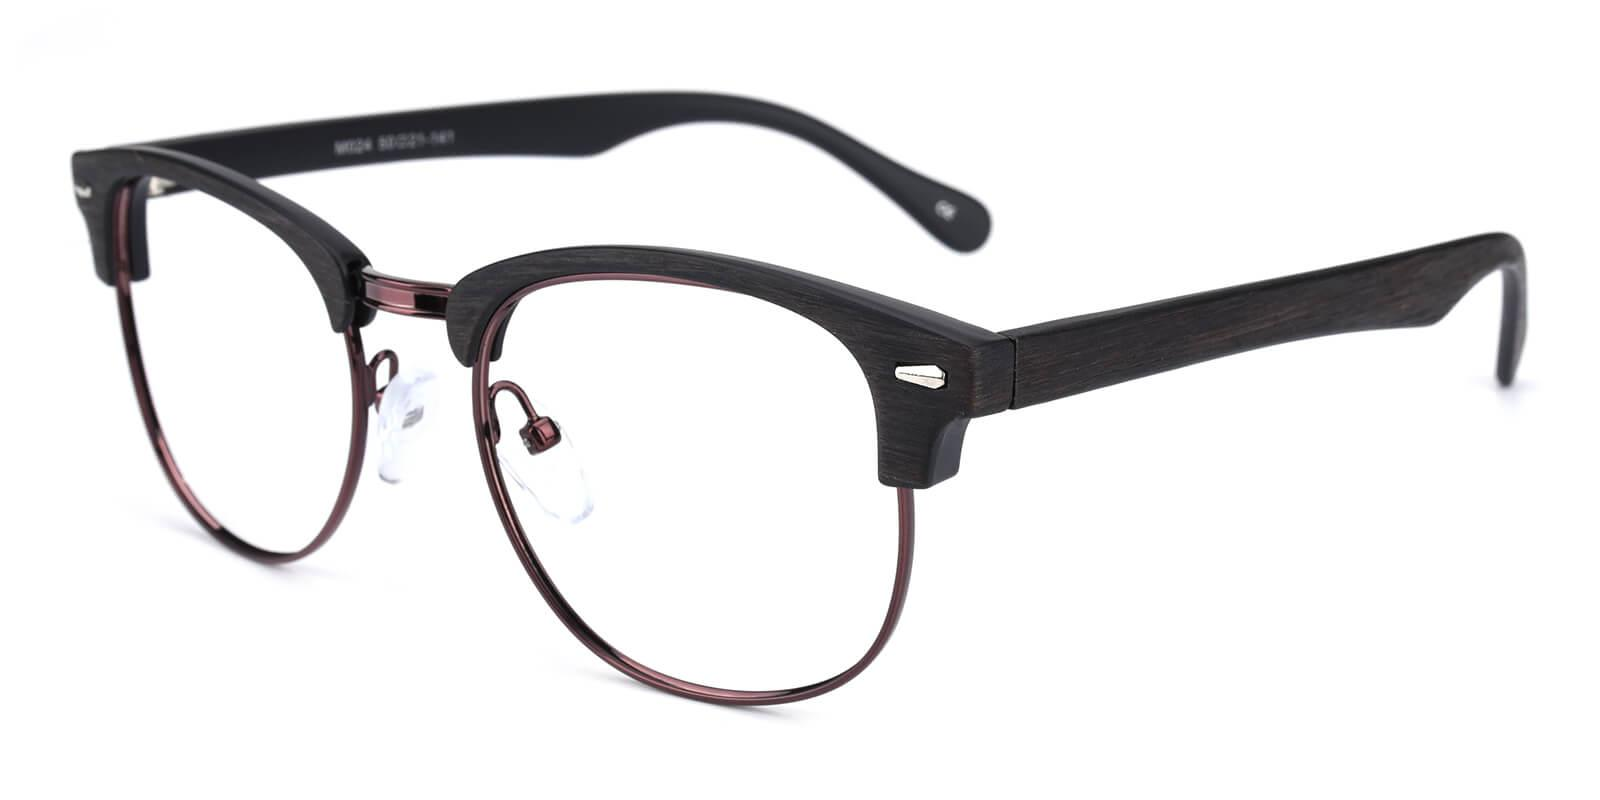 Ferrous-Gun-Browline-Metal / Combination / Plastic-Eyeglasses-additional1